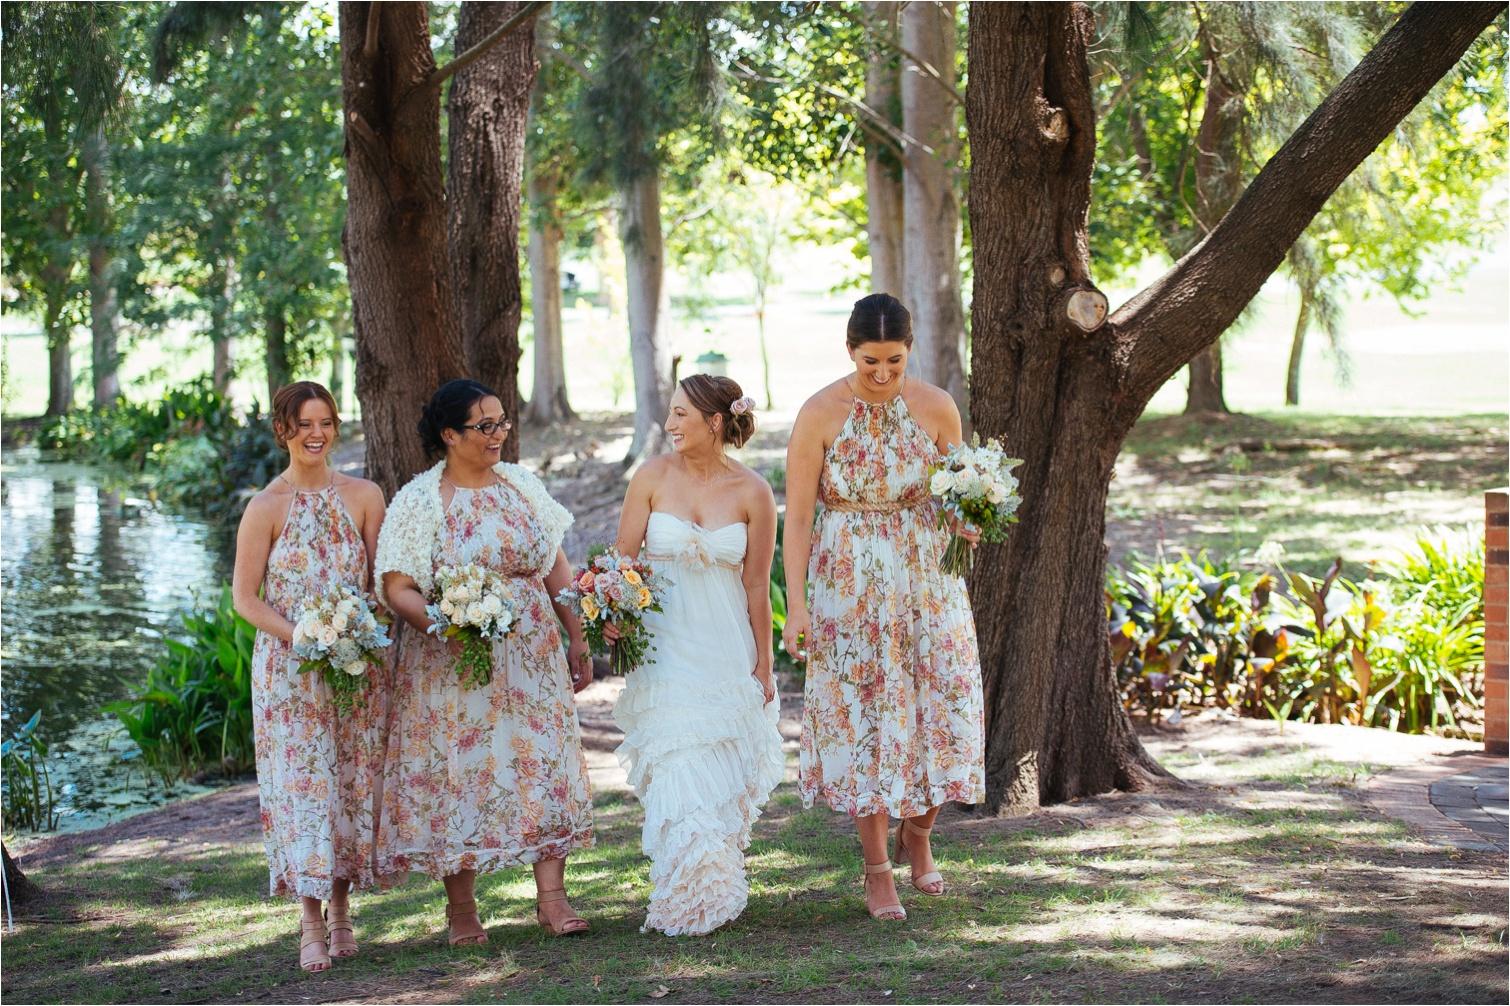 Jenny&Mitch_Sebel_Windsor_Sydney_Polo_Club_wedding-by_The_Follans_Gold_Coast_Wedding_Photographers_0035.jpg